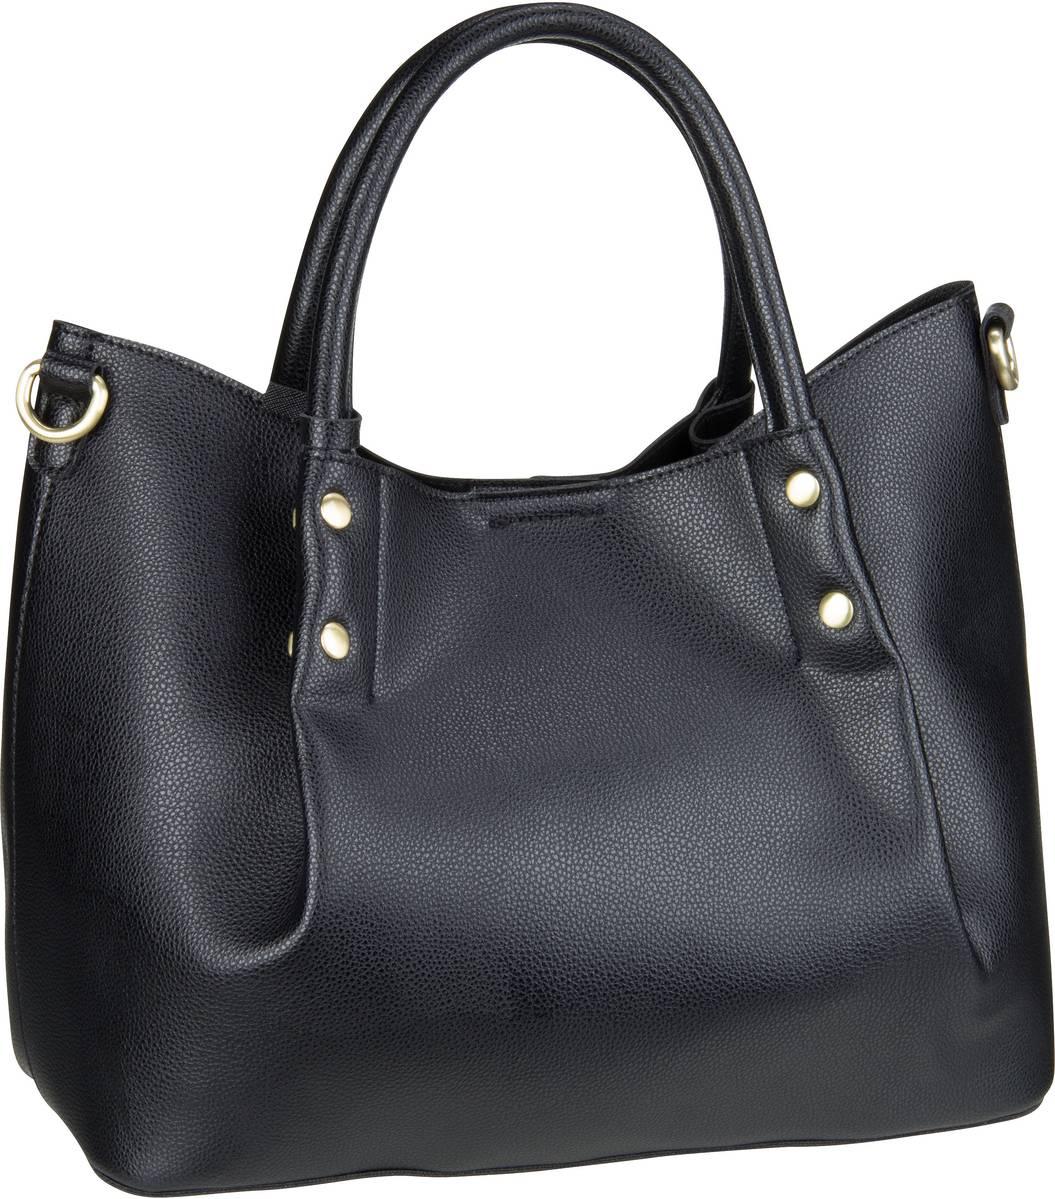 House of Envy Fabulous Shopper Black - Handtasche